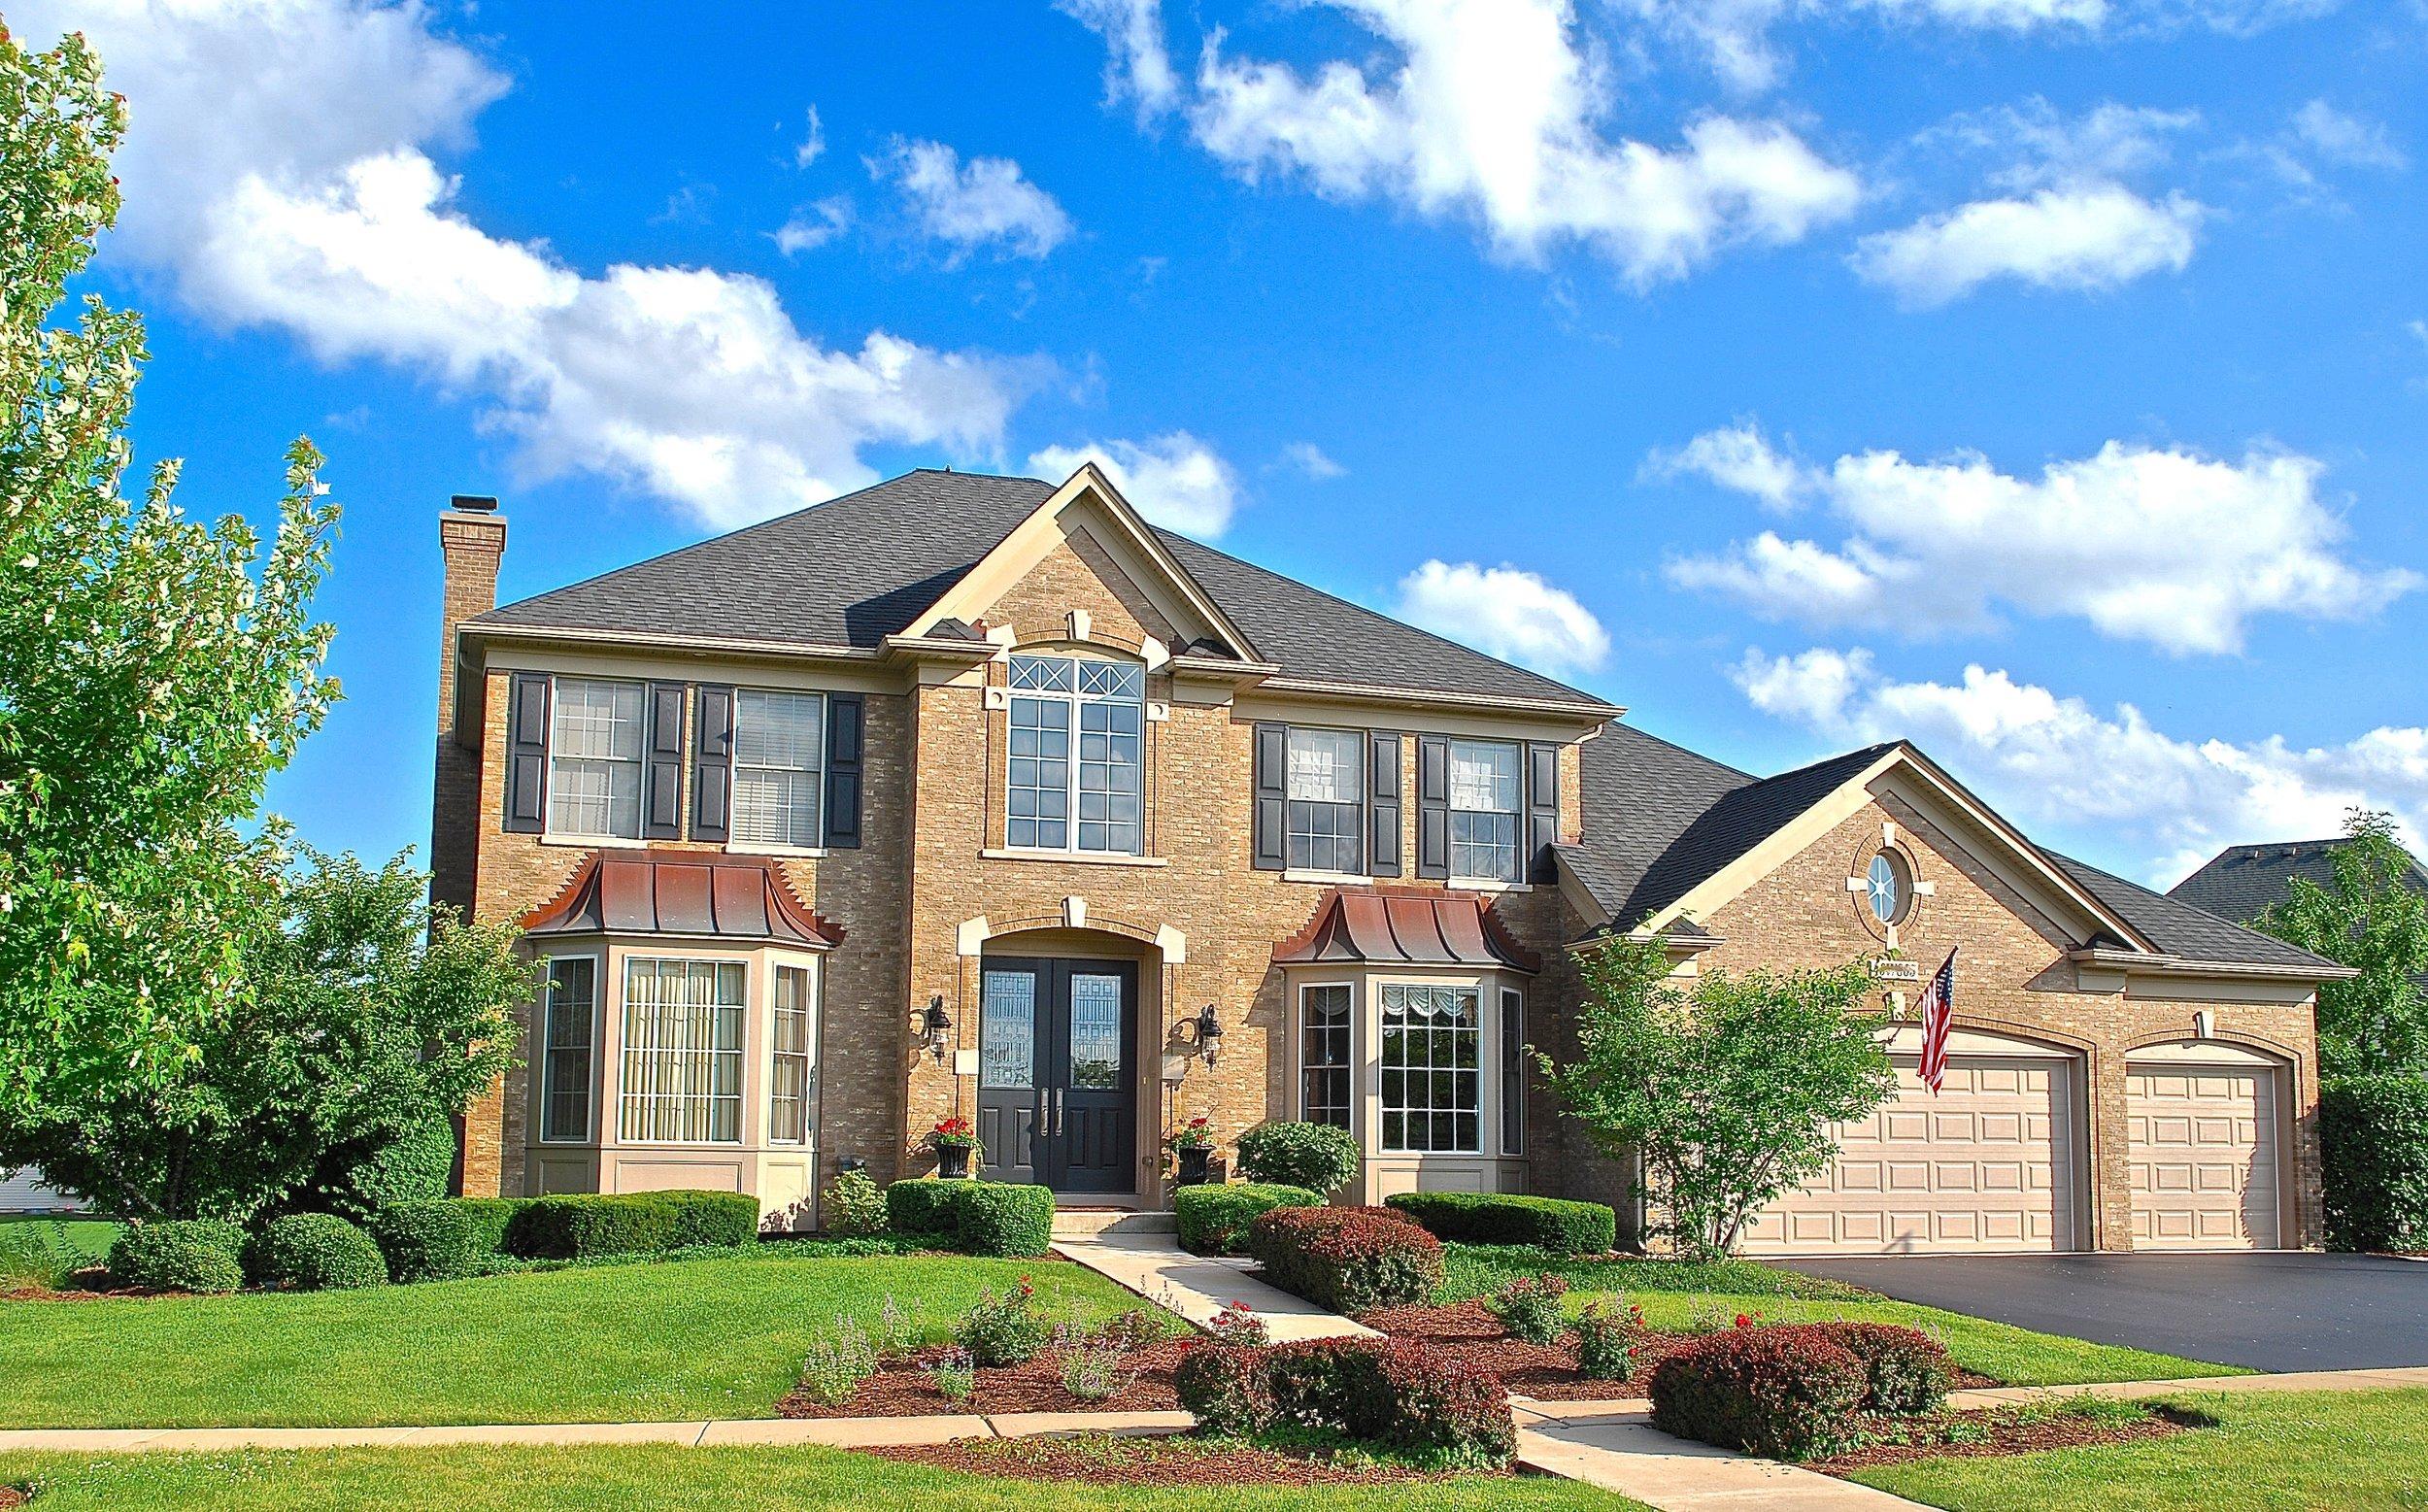 Fox Creek St. Charles IL. 60175.  Custom Home by Southampton Builders